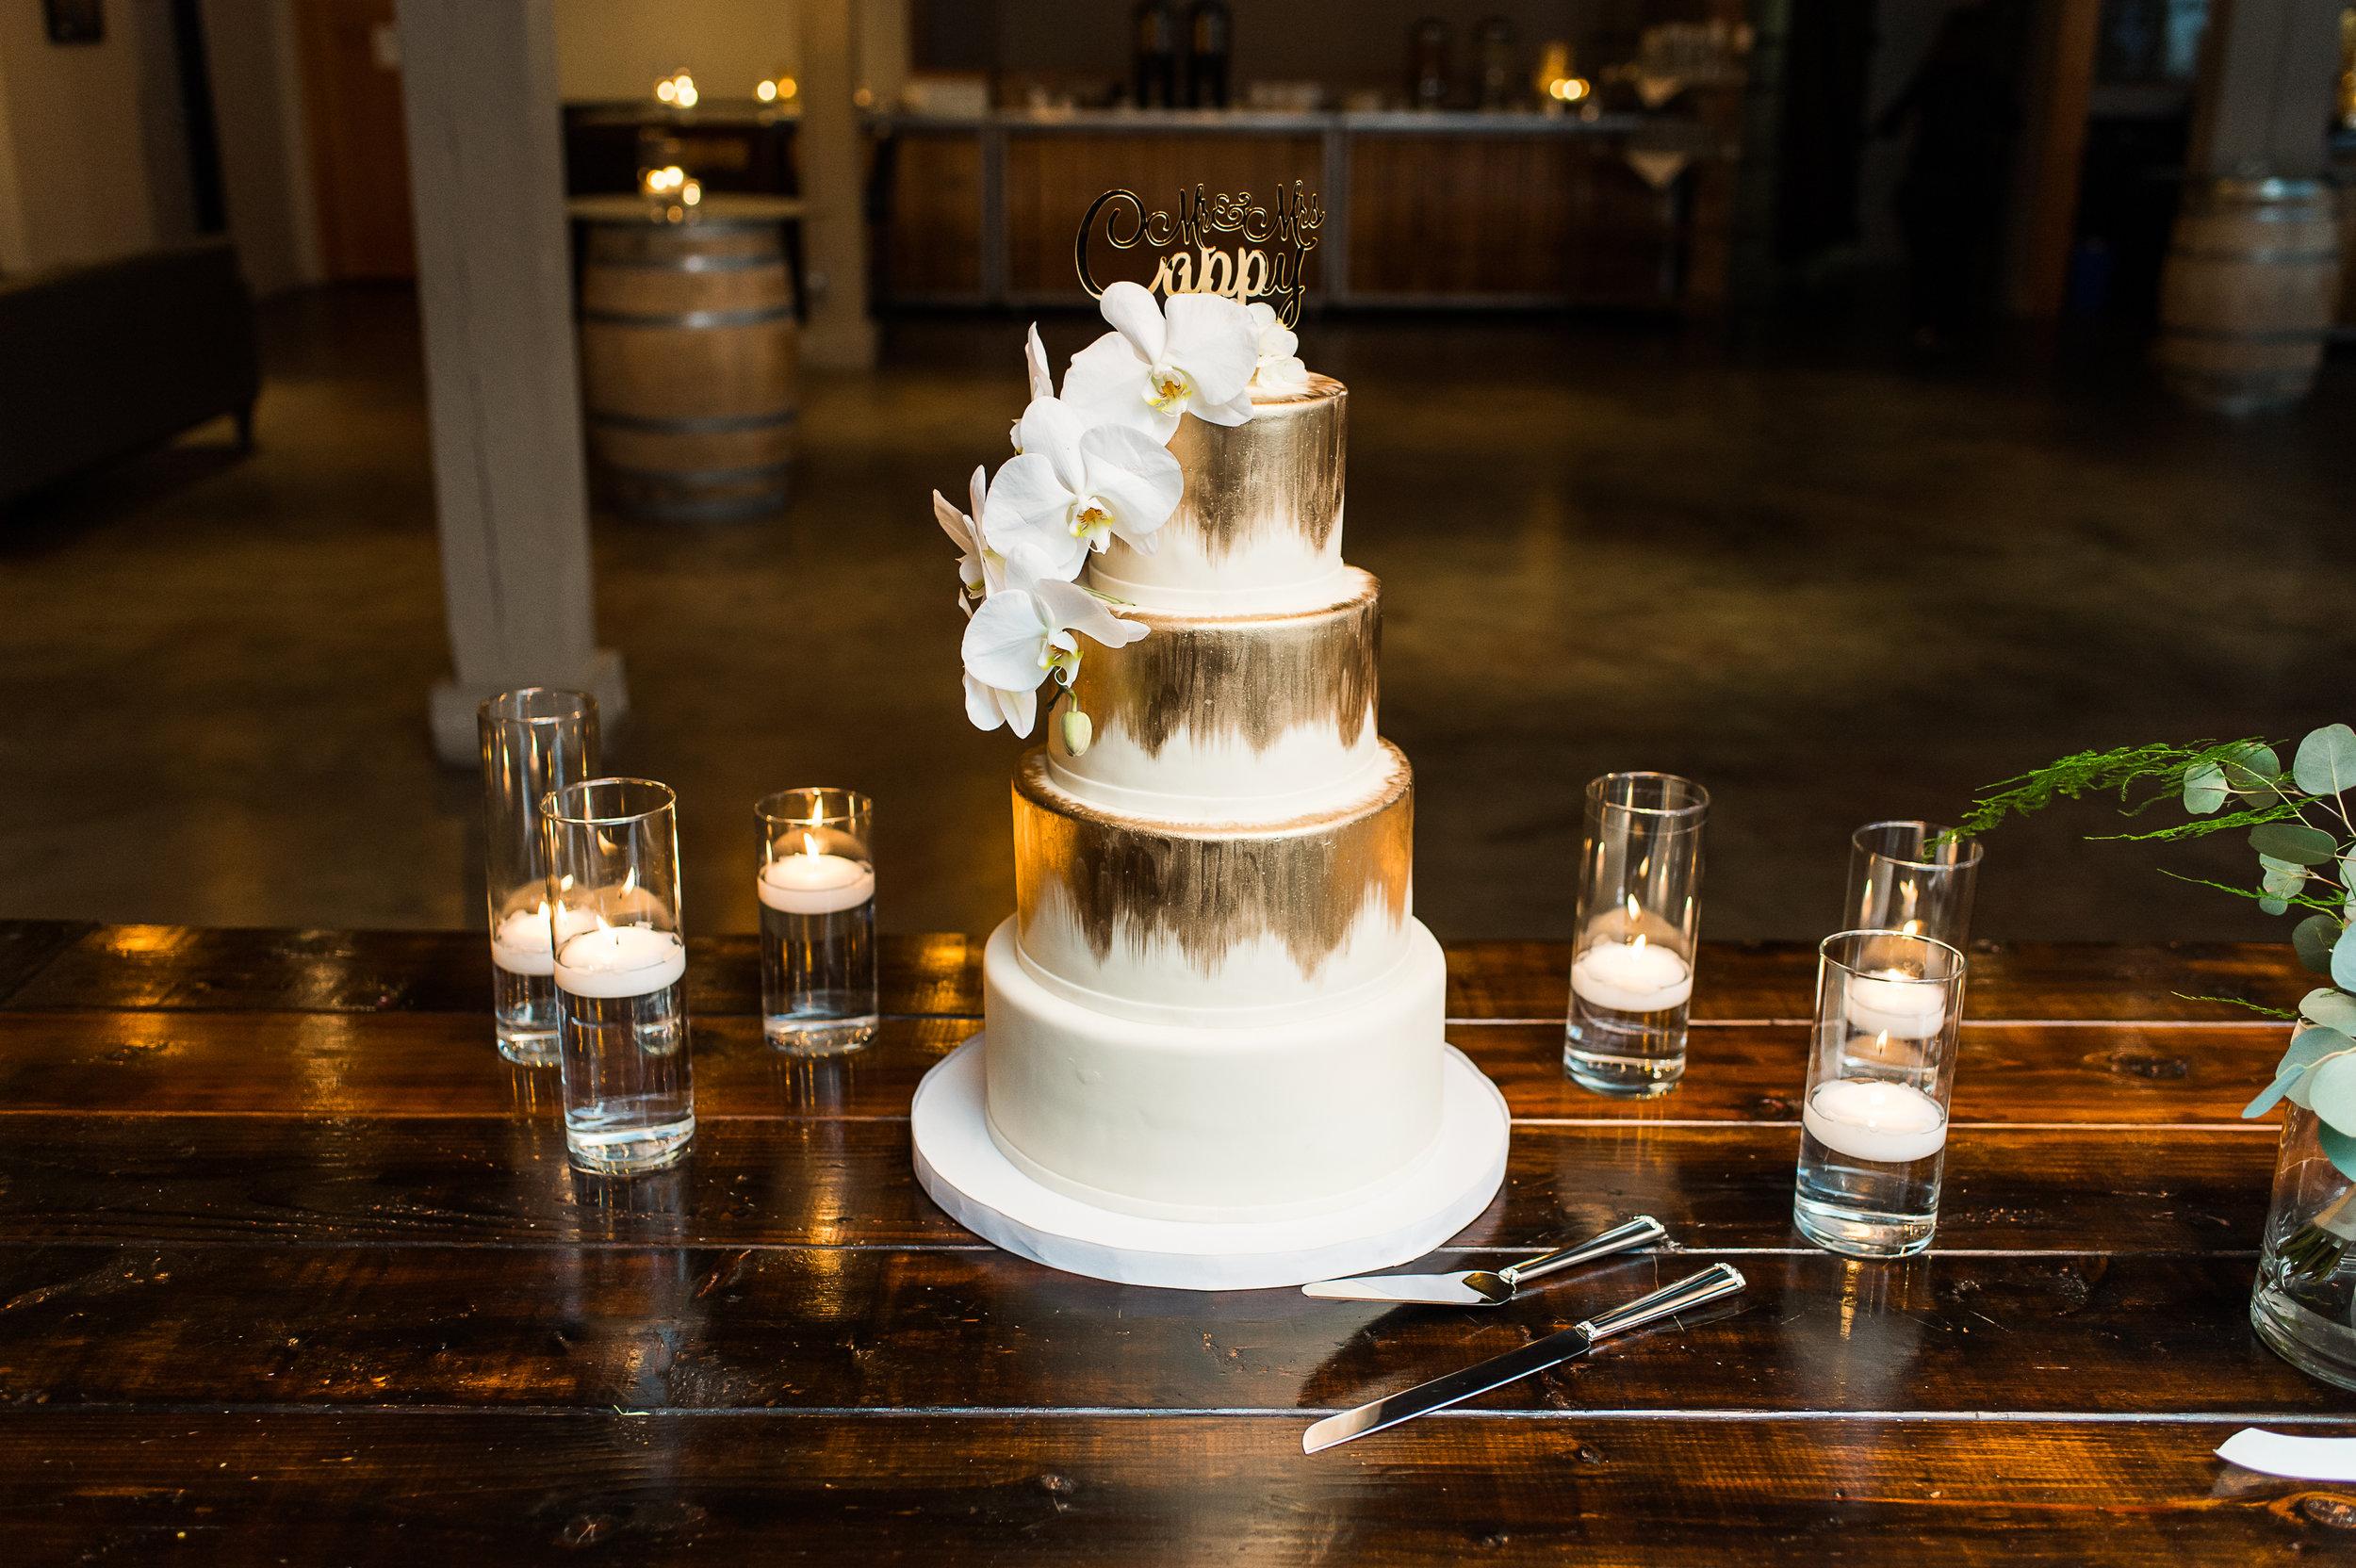 JJ-wedding-Van-Wyhe-Photography-437.jpg